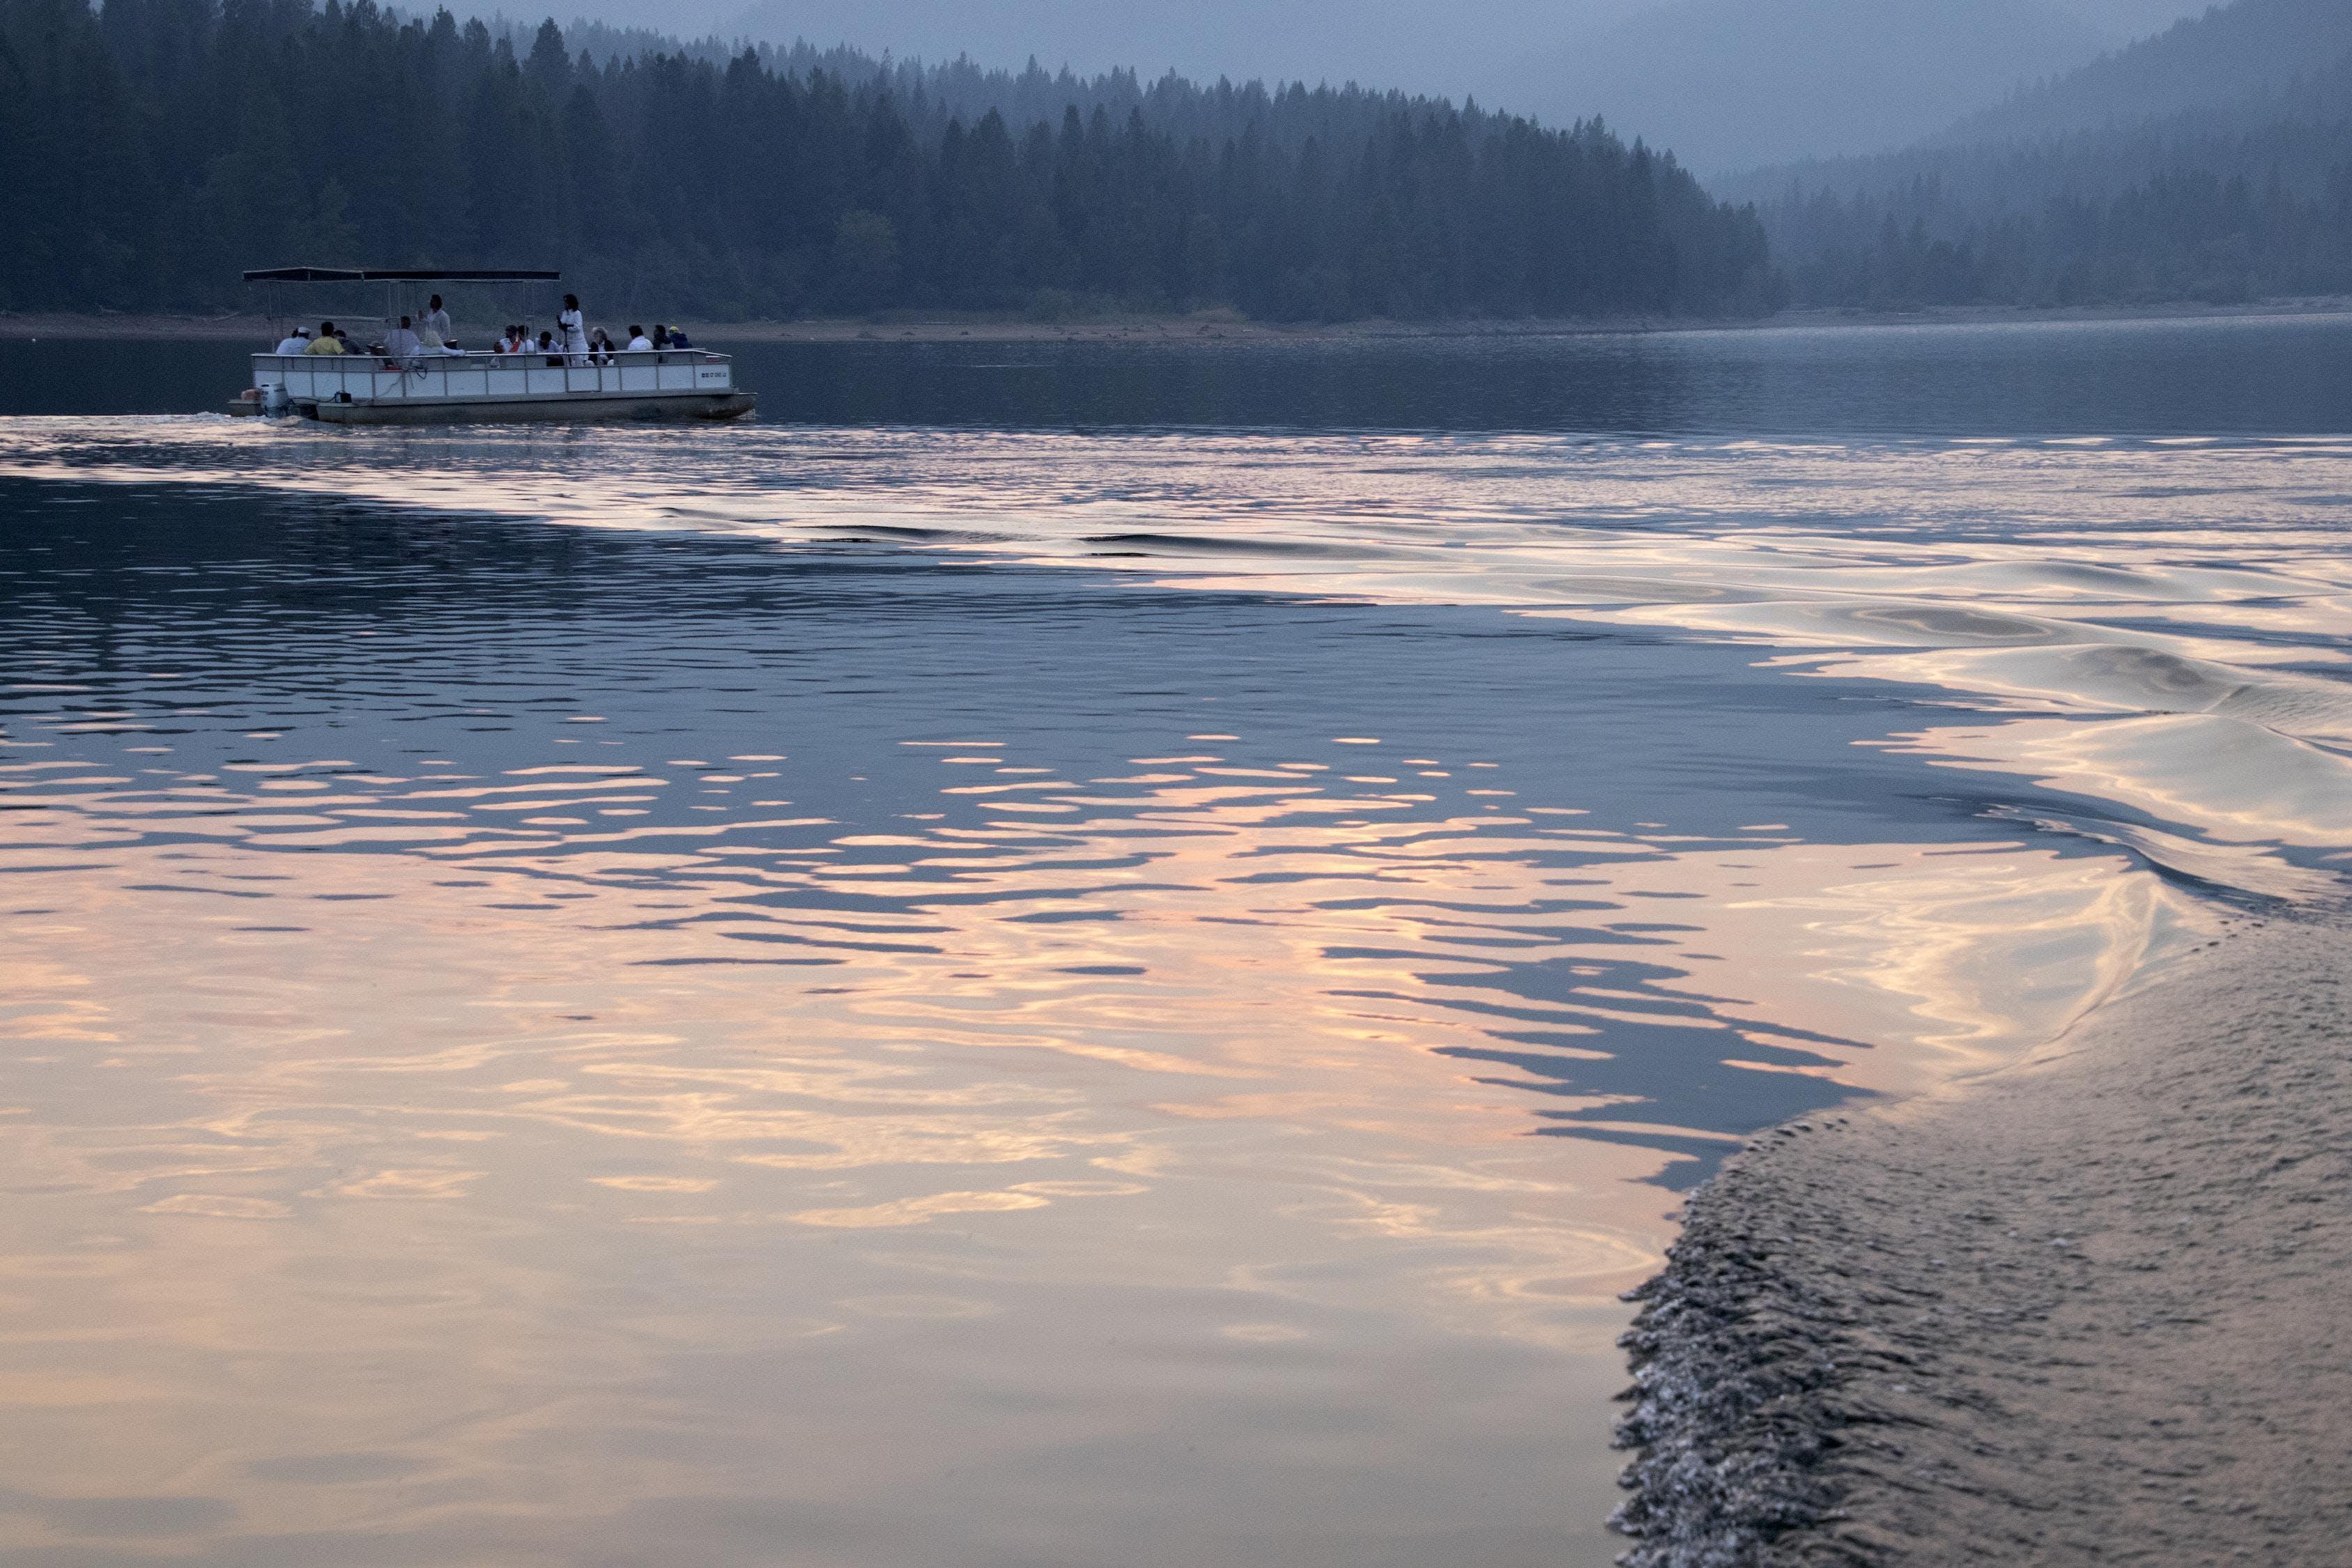 Mt. Shasta, CA – 2019 Benefactor's New Life Awakening Retreat